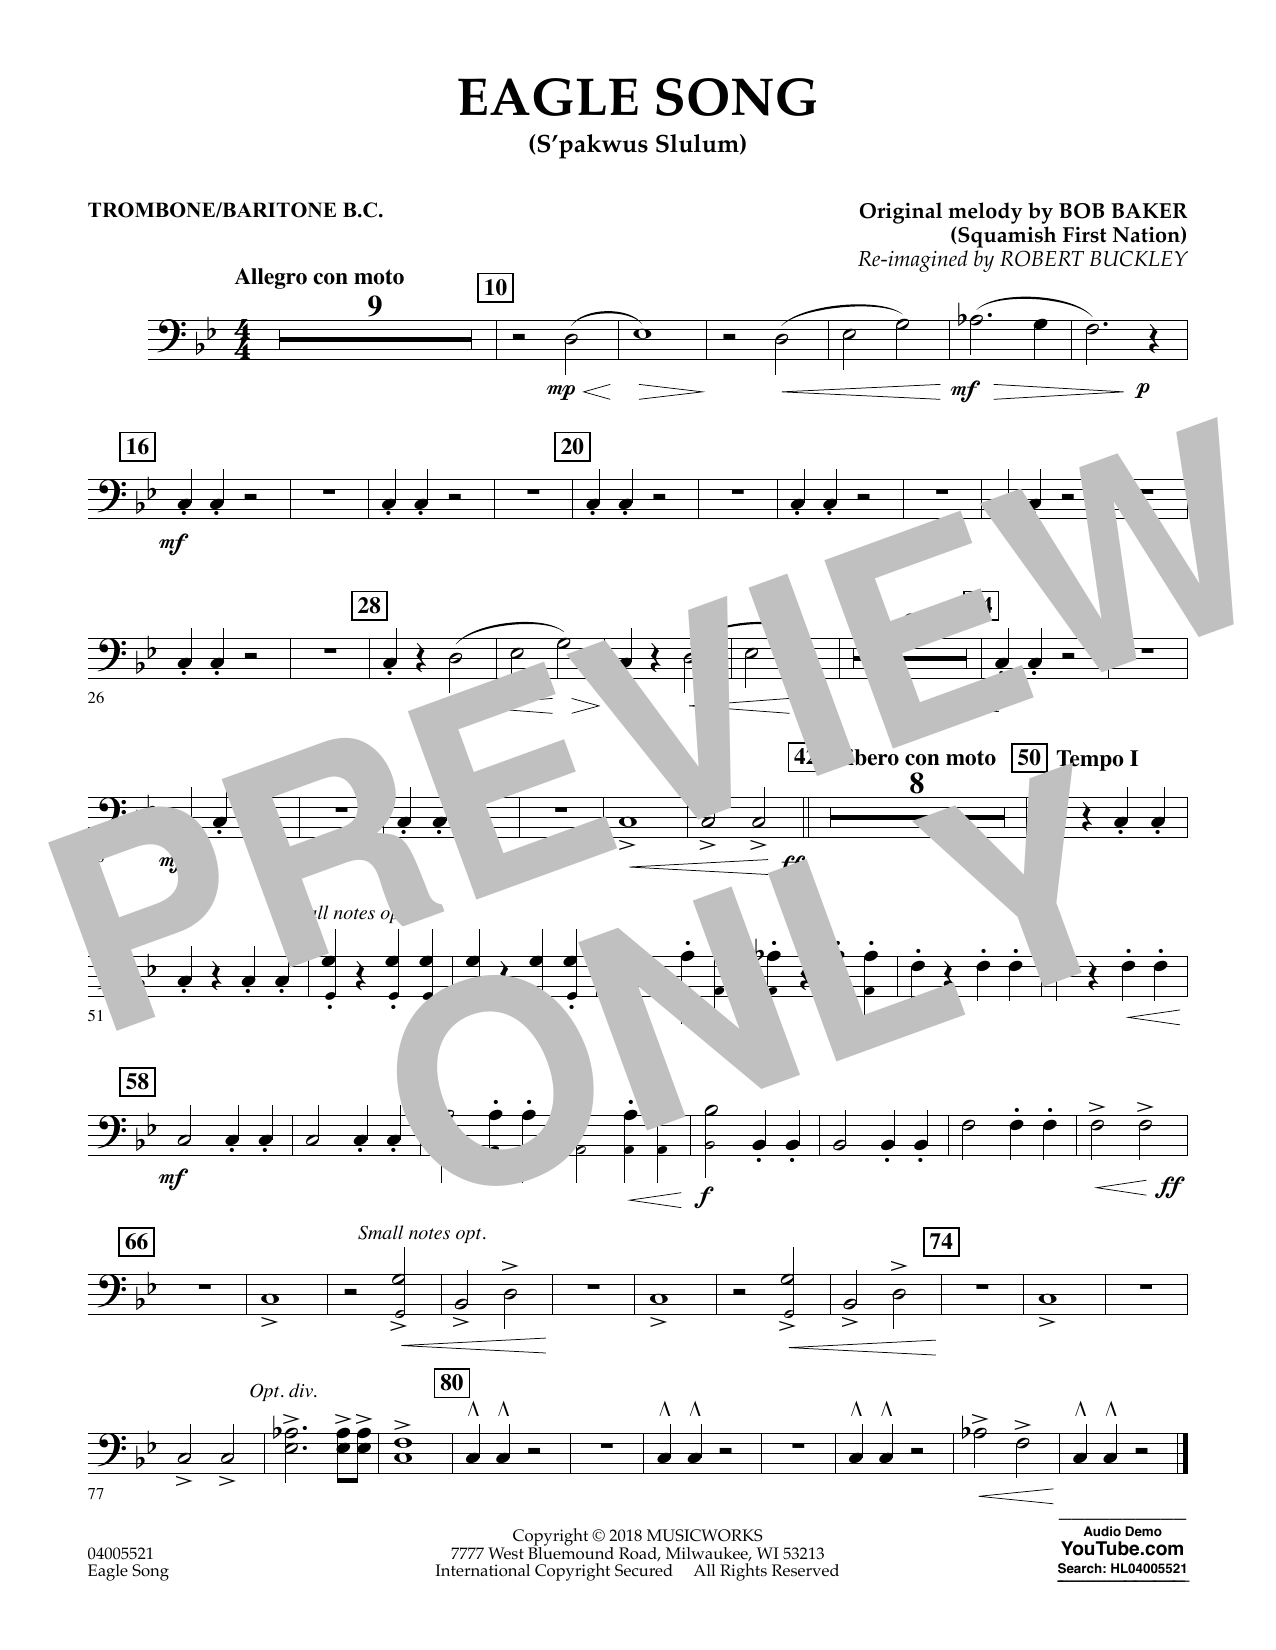 Eagle Song - Trombone/Baritone B.C. (Concert Band)